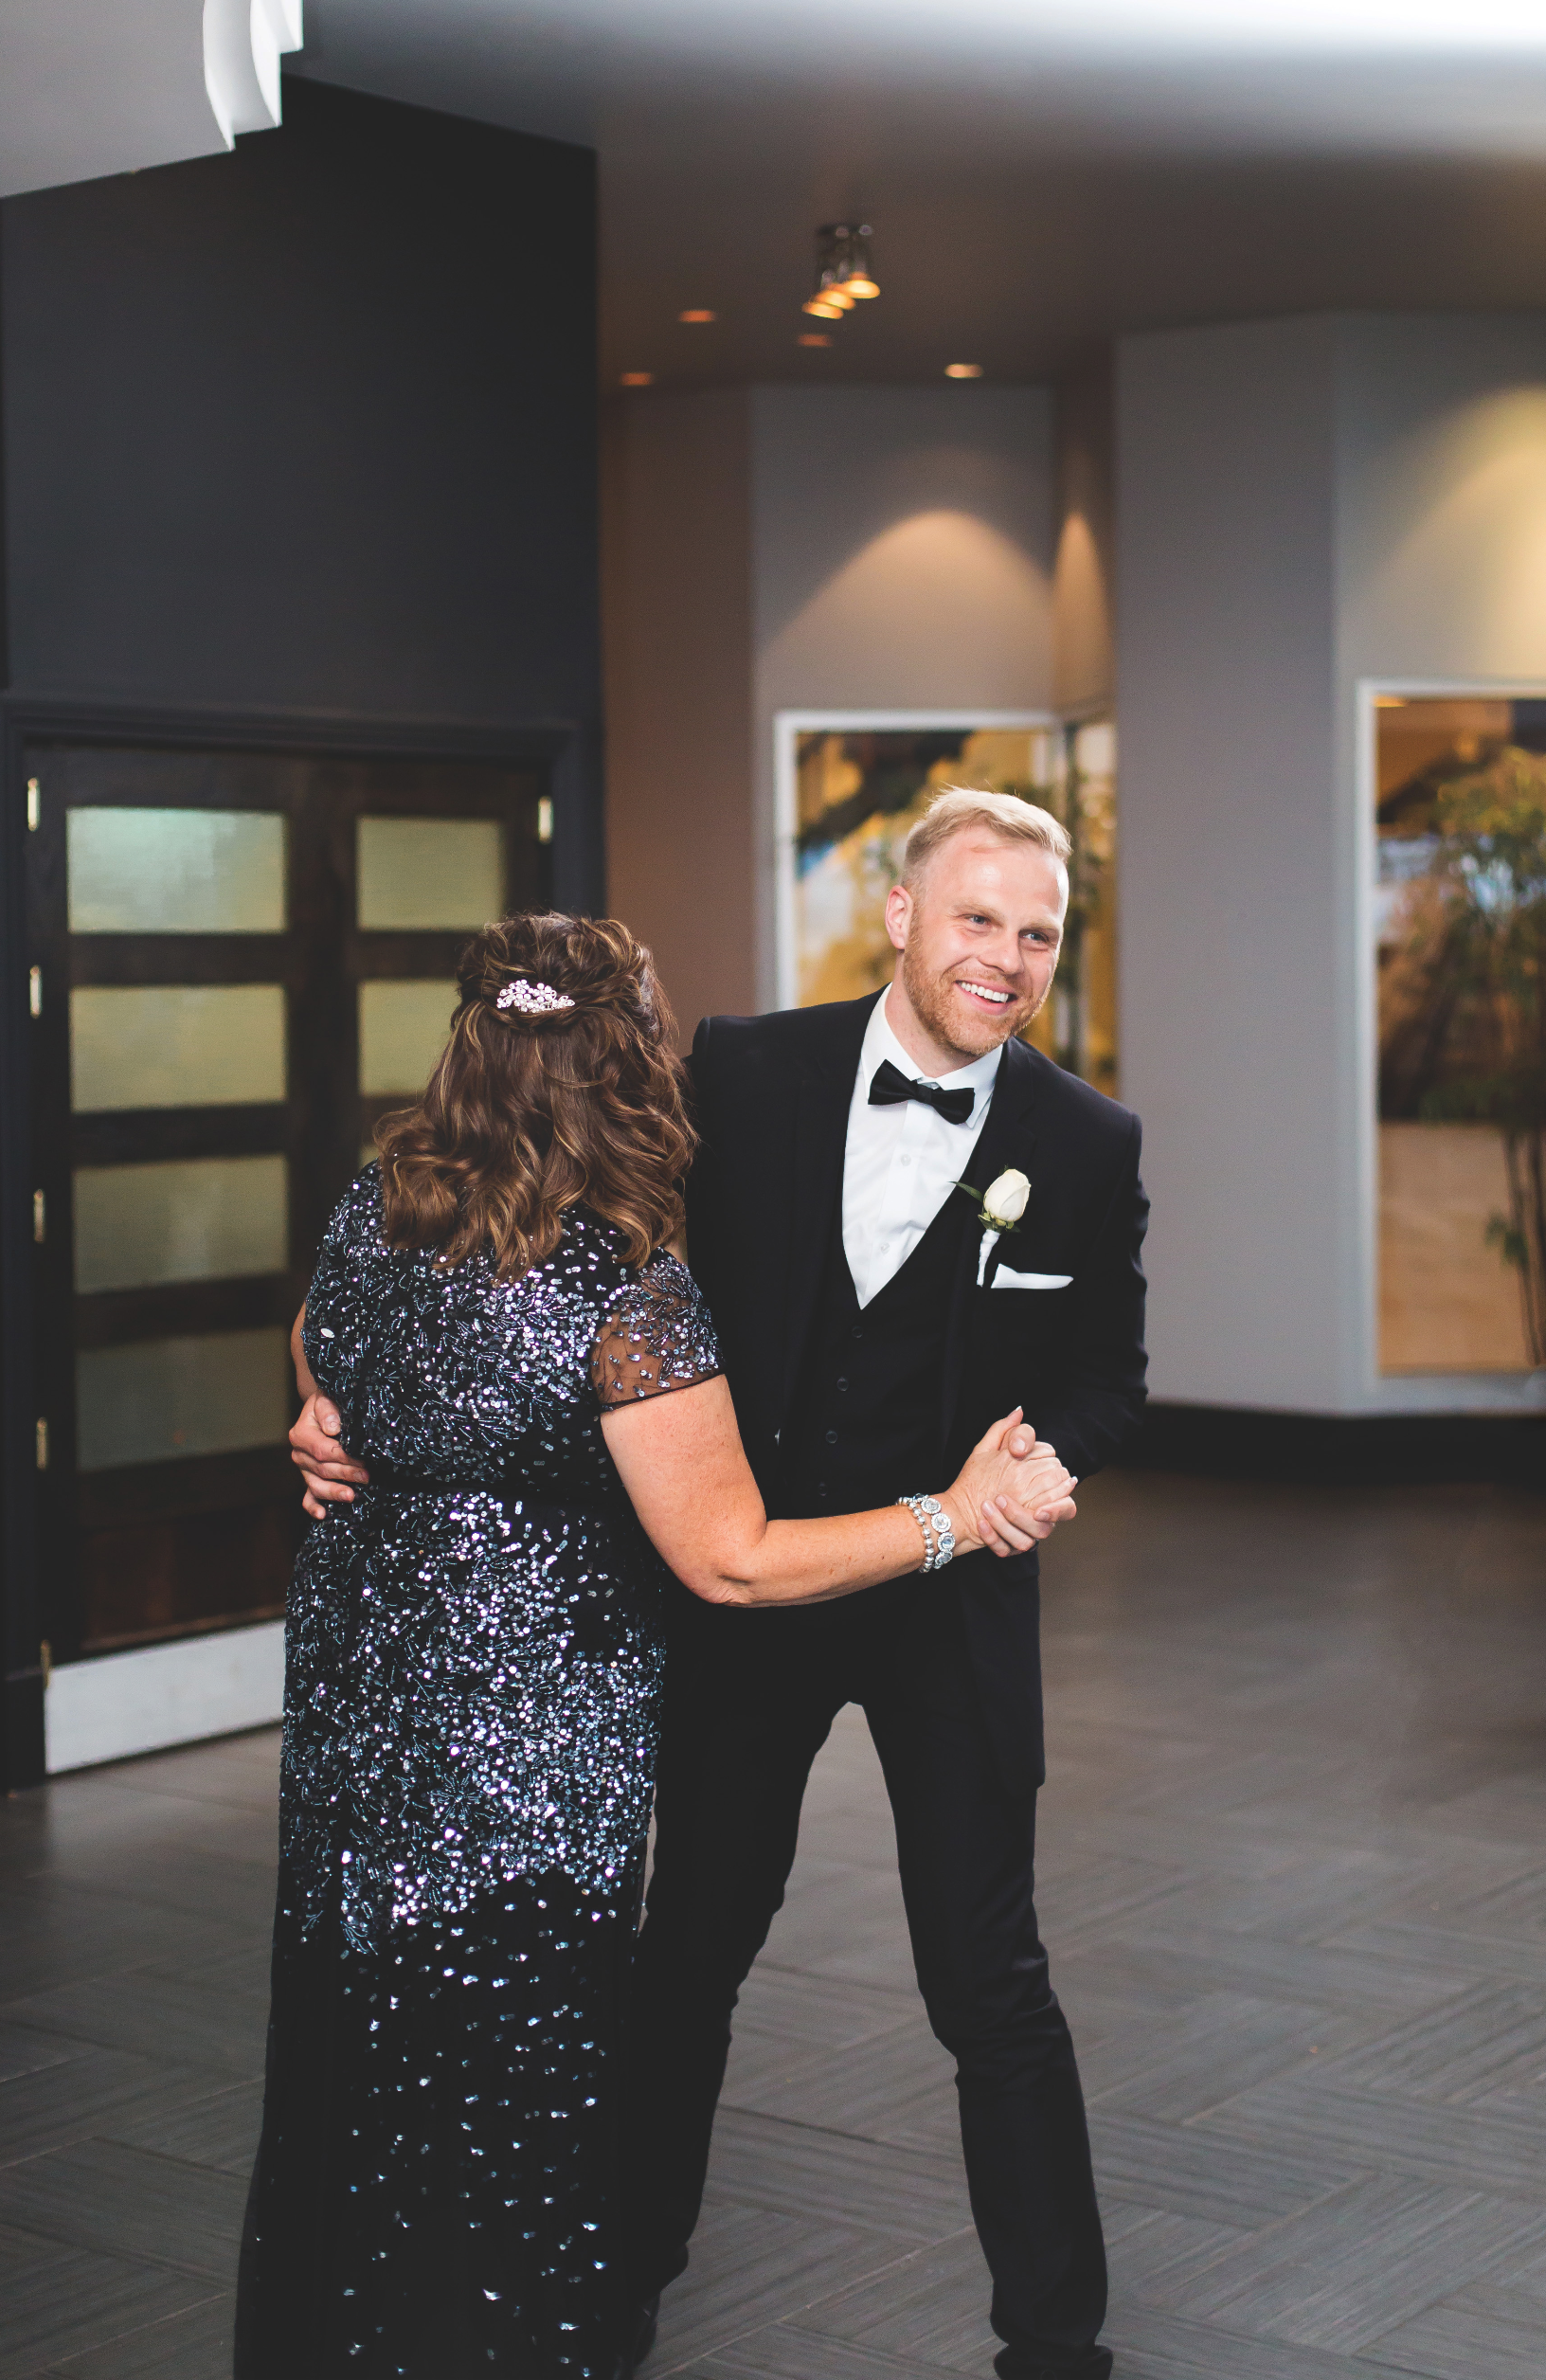 Wedding-Harbour-Banquet-Center-Oakville-Photographer-Wedding-Hamilton-Saint-James-Espresso-Downtown-HamOnt-GTA-Niagara-Toronto-Moments-by-Lauren-Photography-Photo-Image-67.png